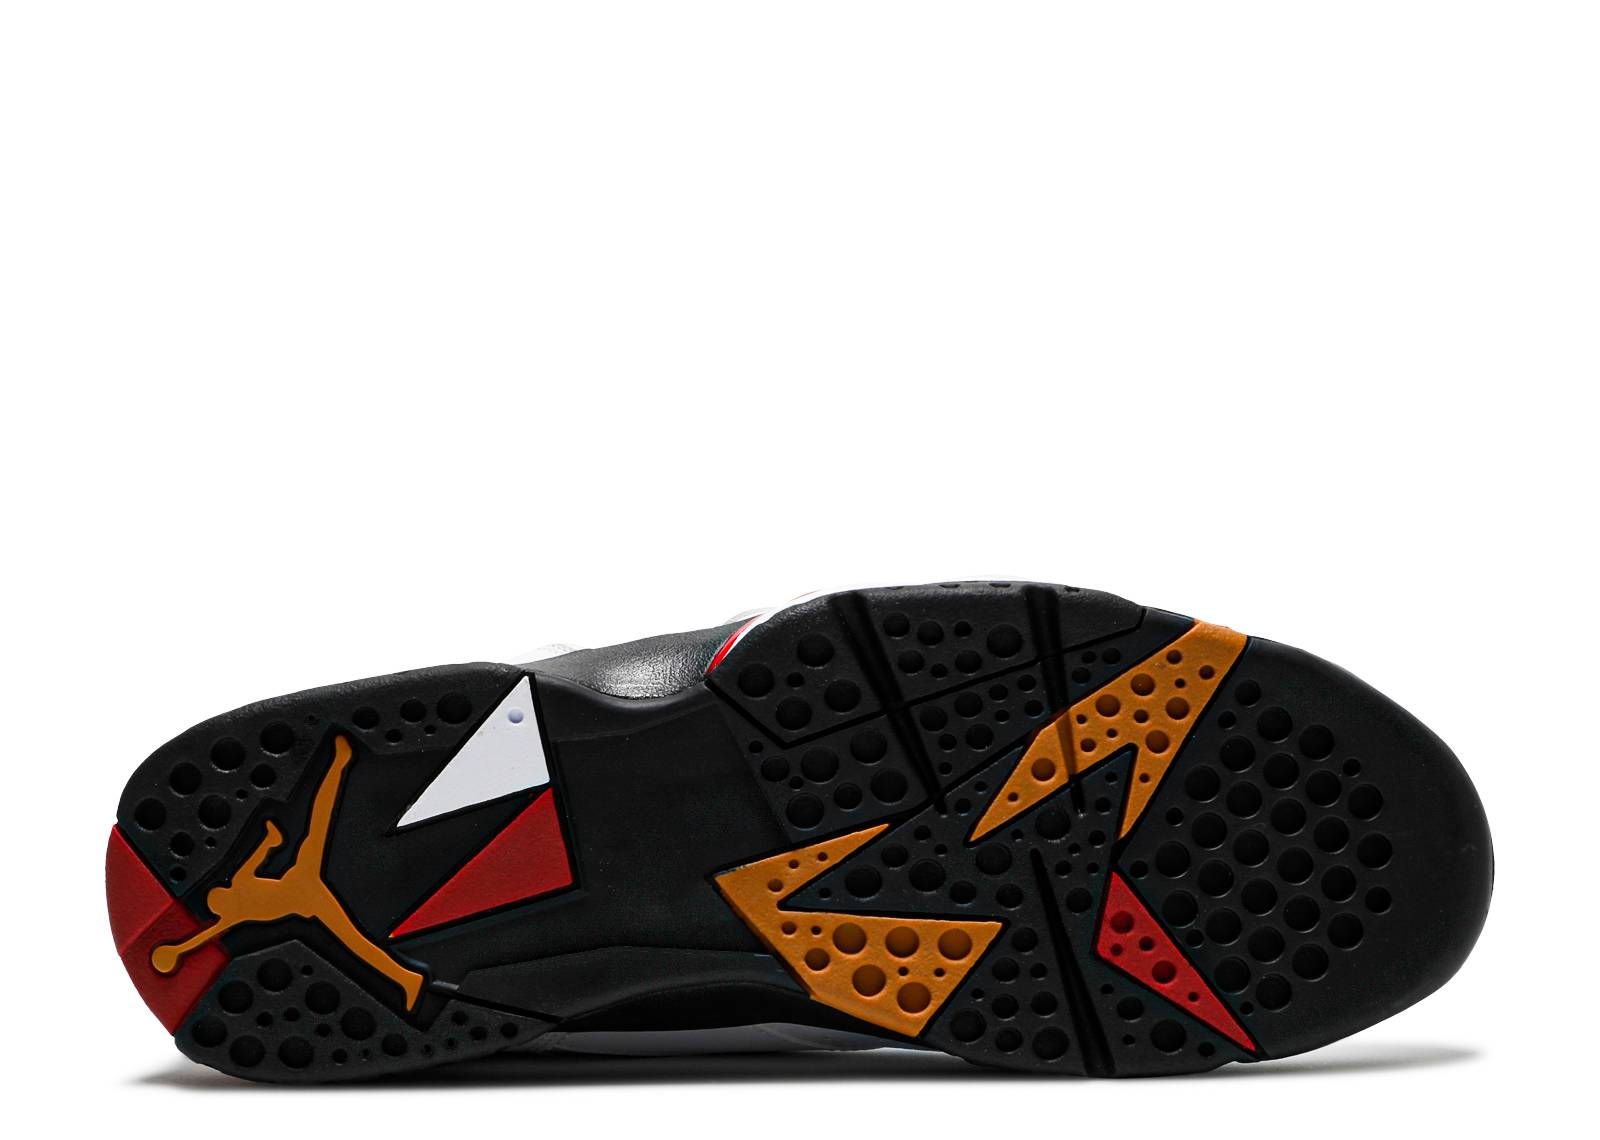 timeless design ad50a 43215 air jordan retro 7 cardinal for sale